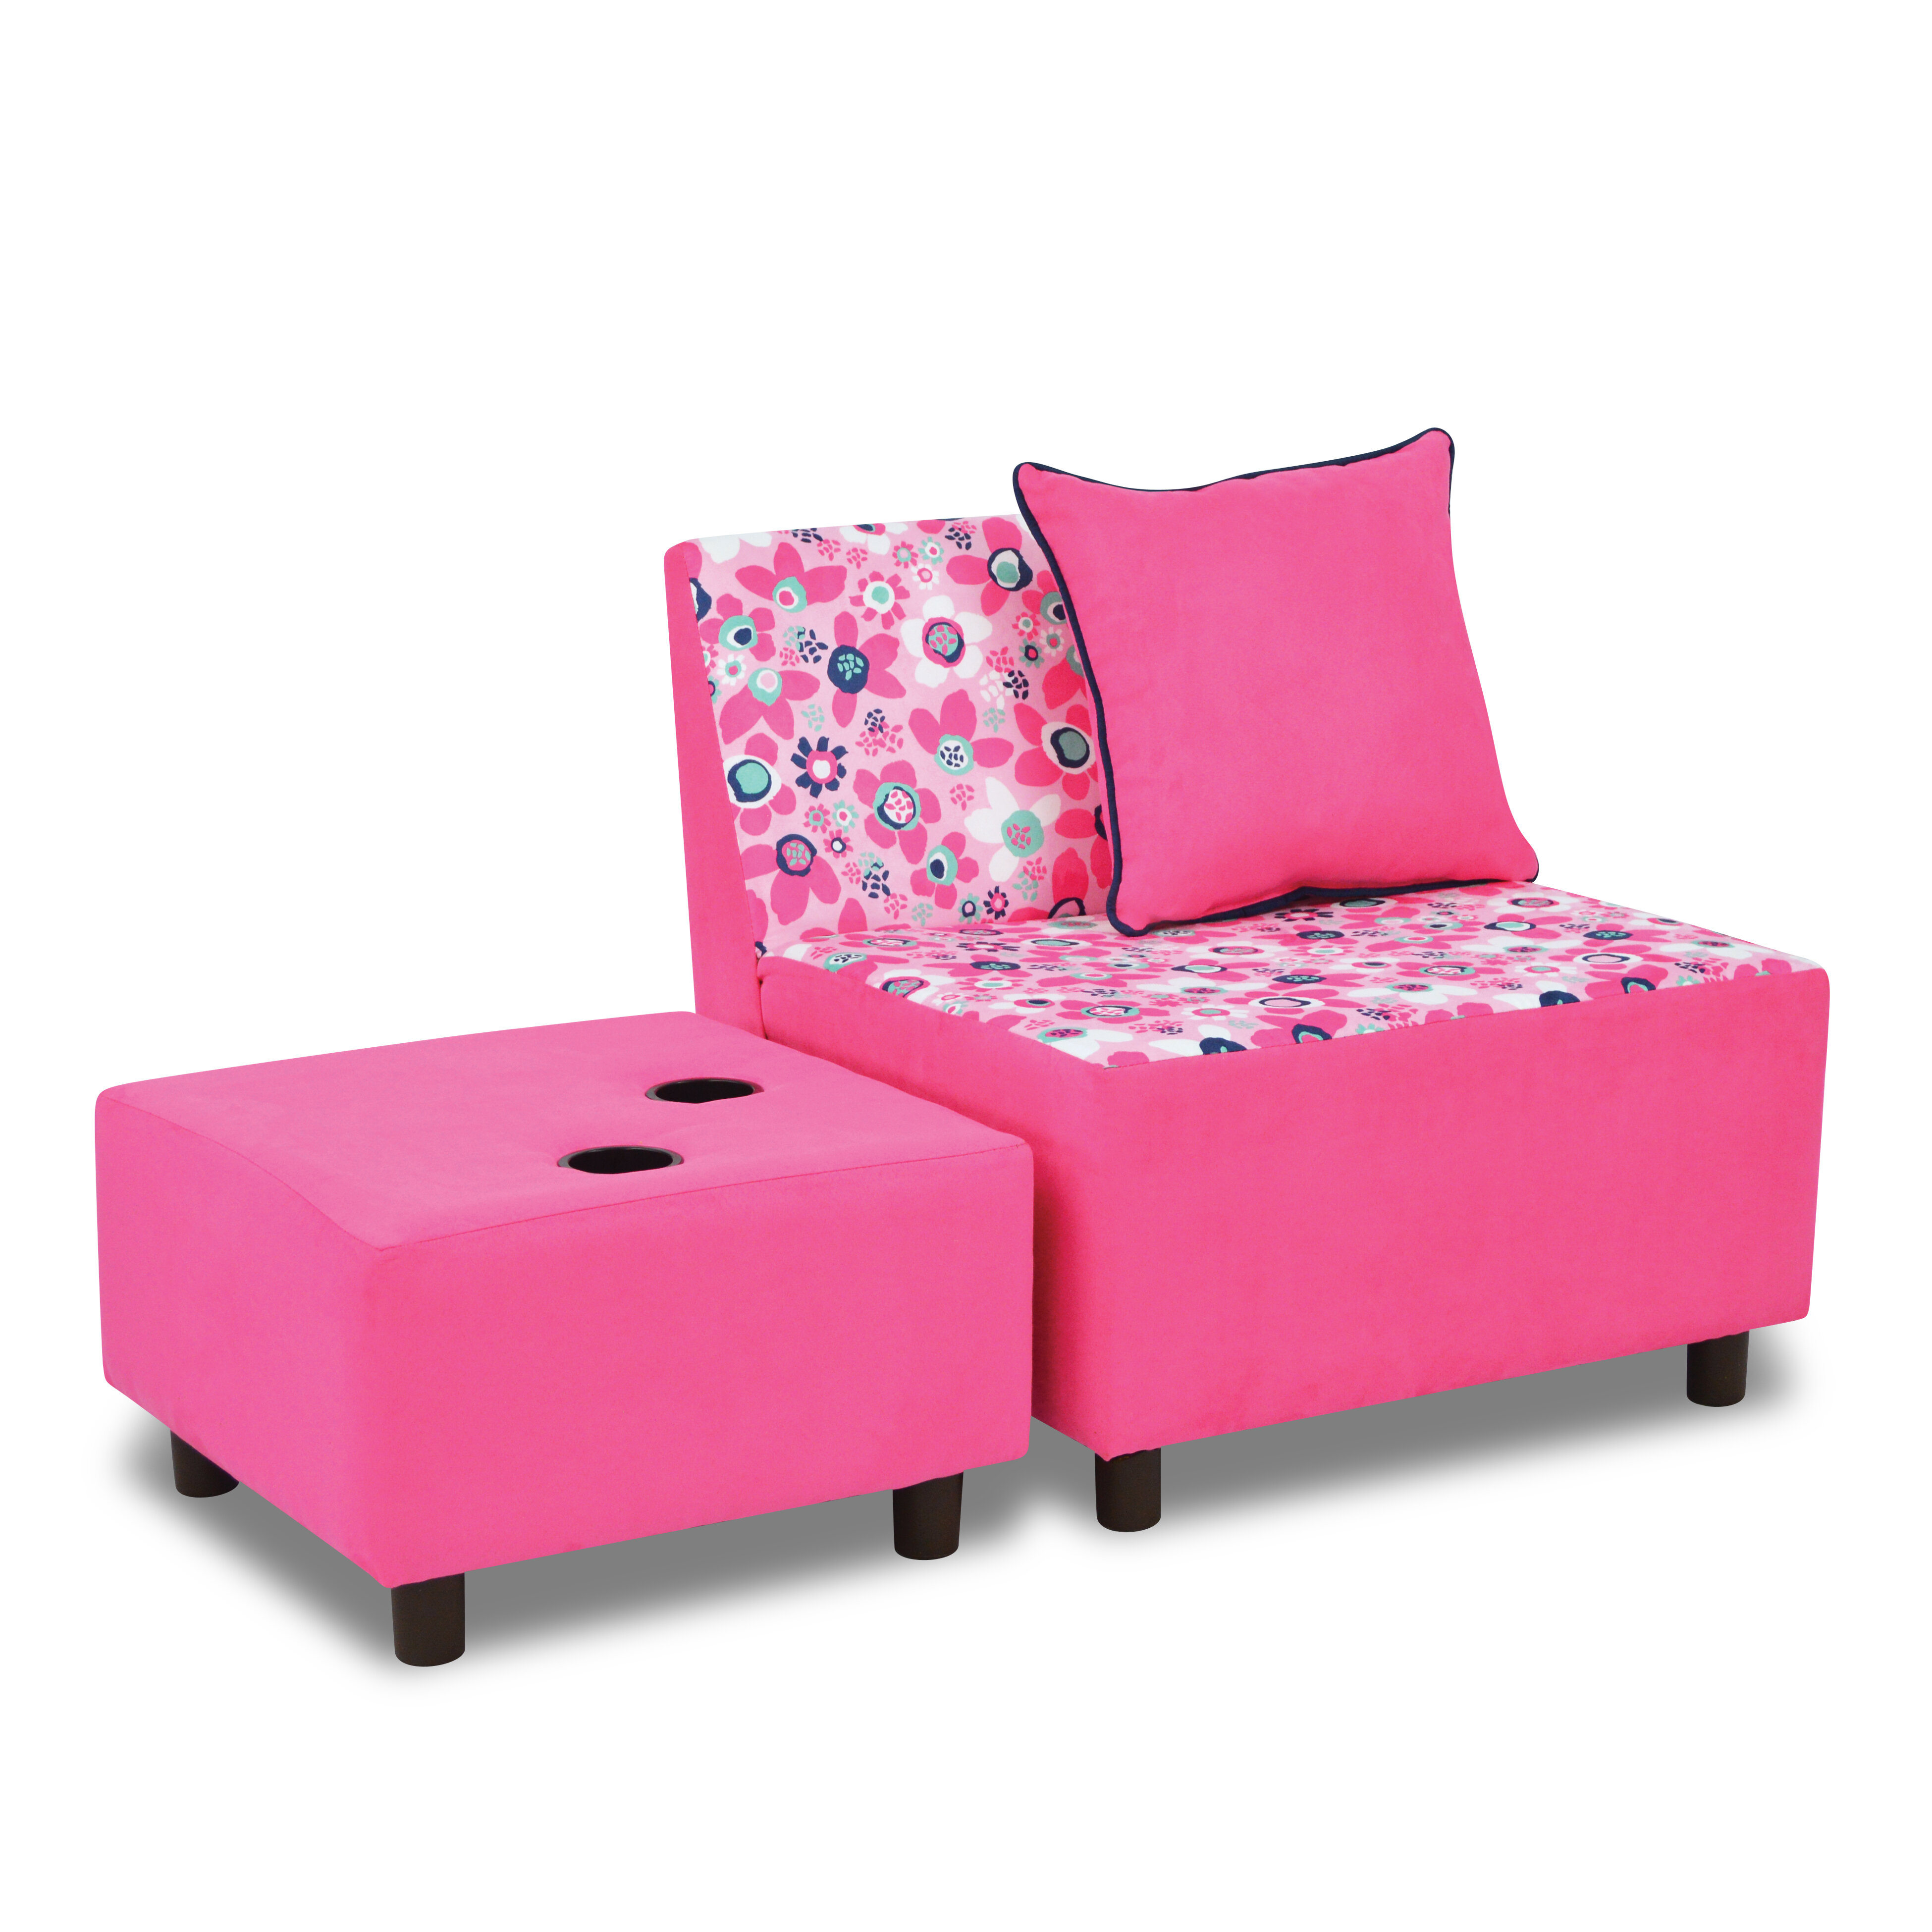 Superieur Kangaroo Trading Company Tween Kids Chair And Ottoman With Cup Holder |  Wayfair